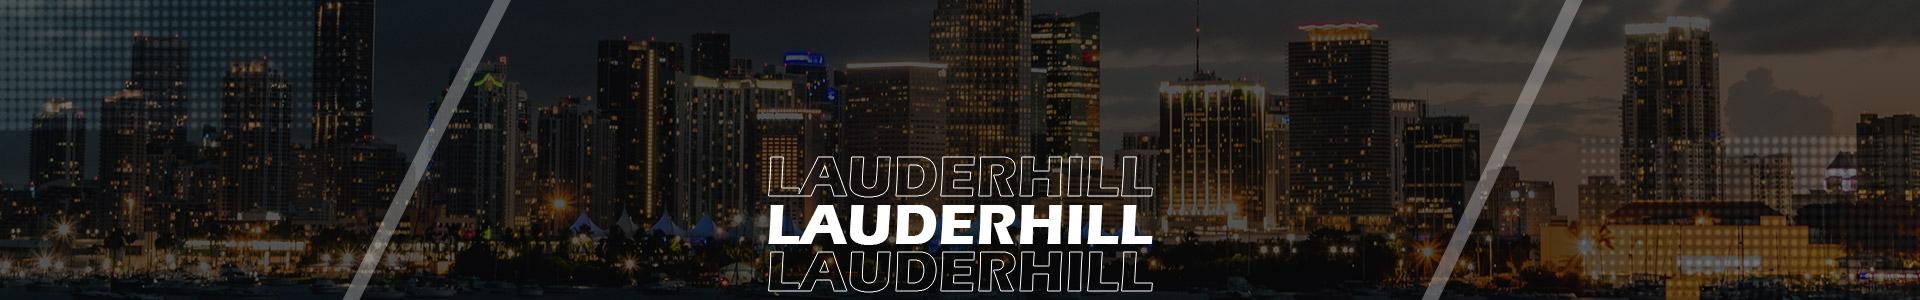 lauderhill-landing